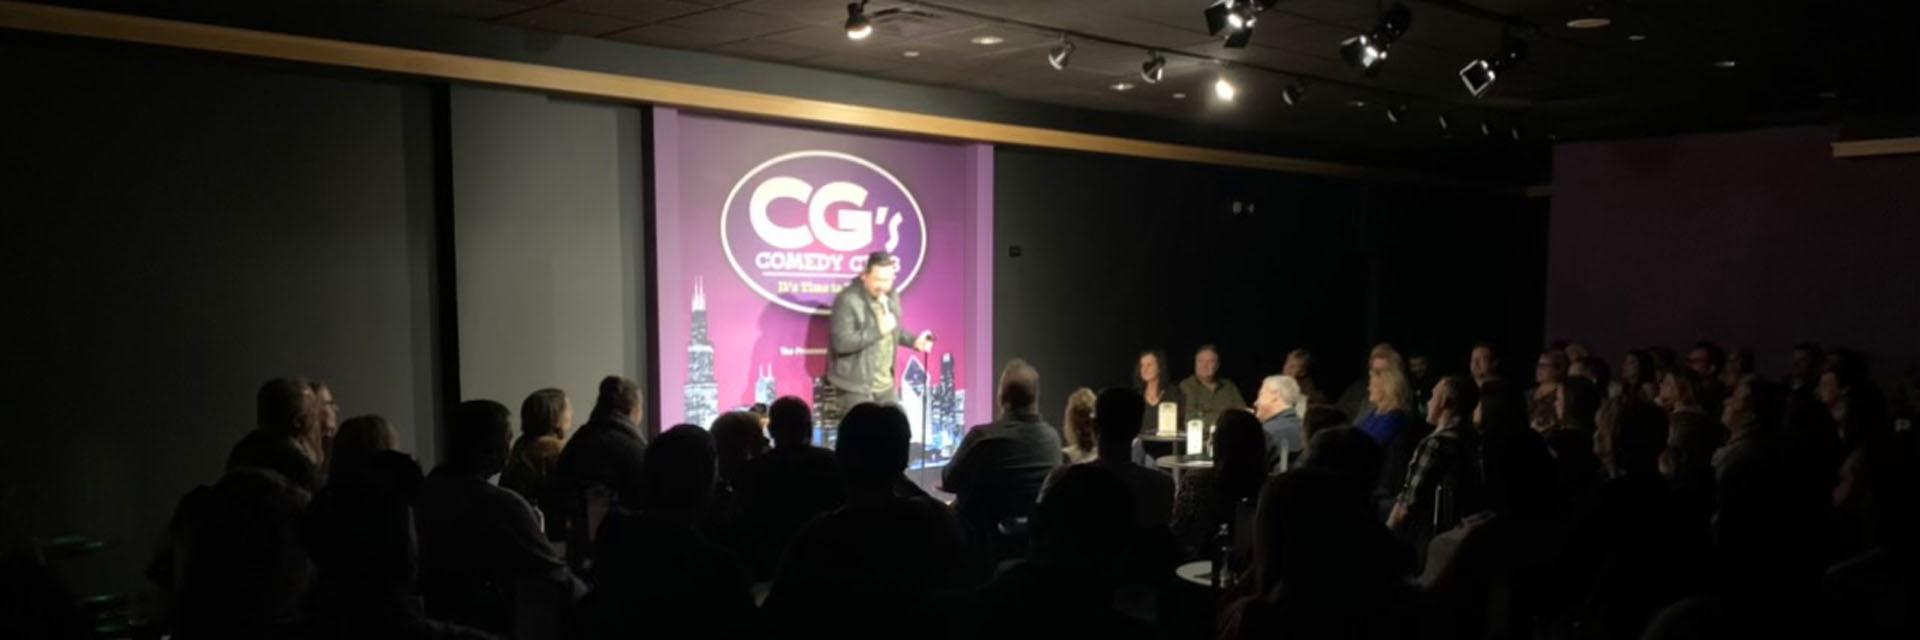 Bolingbrook Comedy Club